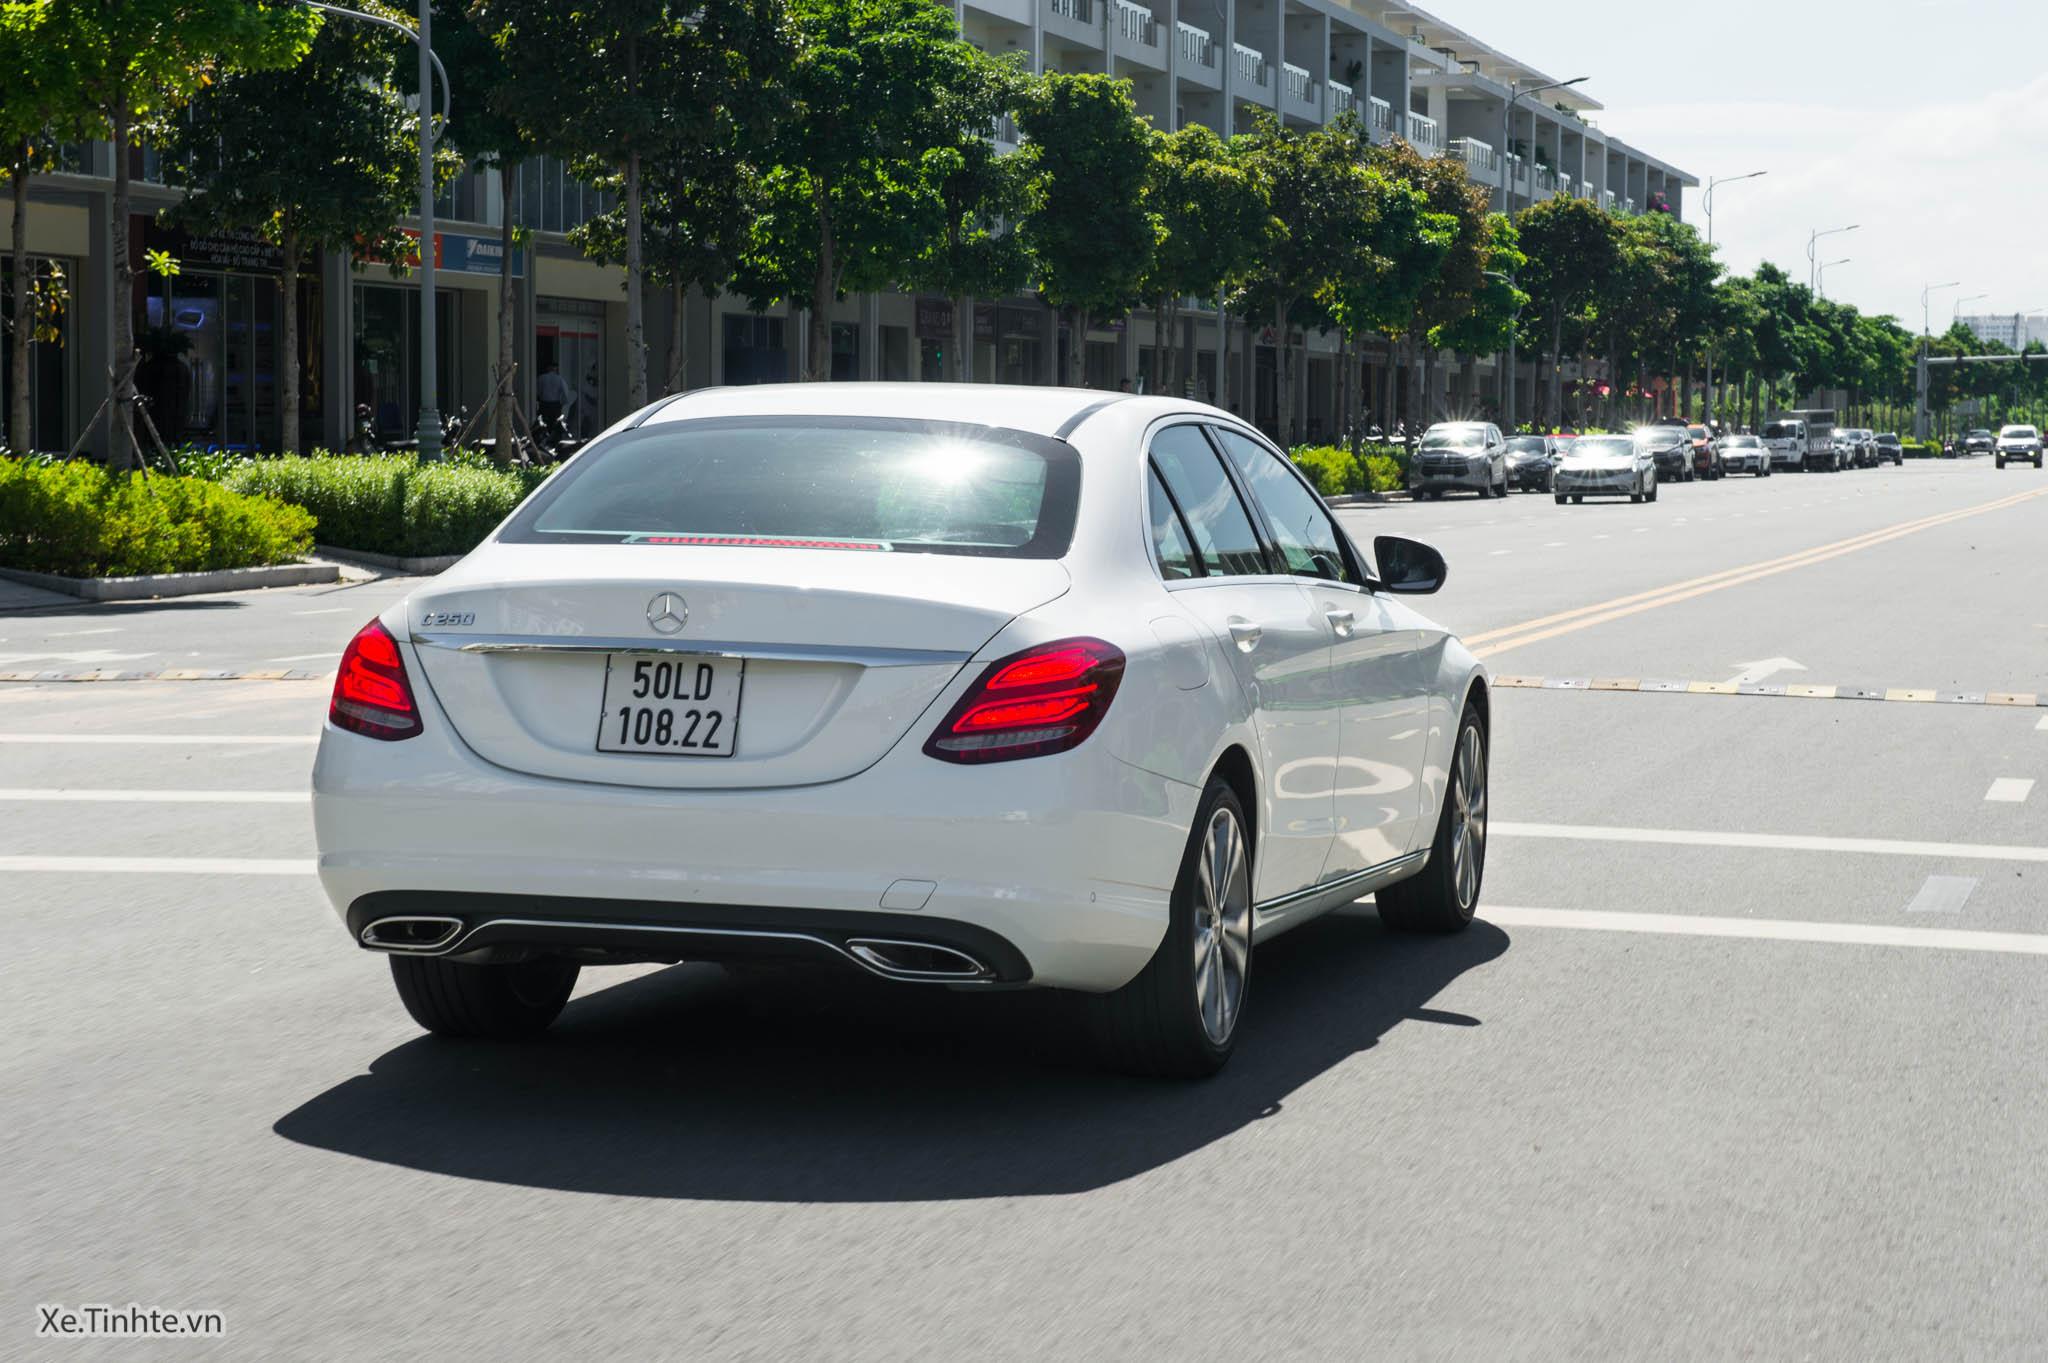 Mercedes_C250 Exclusive_Xe.tinhte.vn-7453.jpg